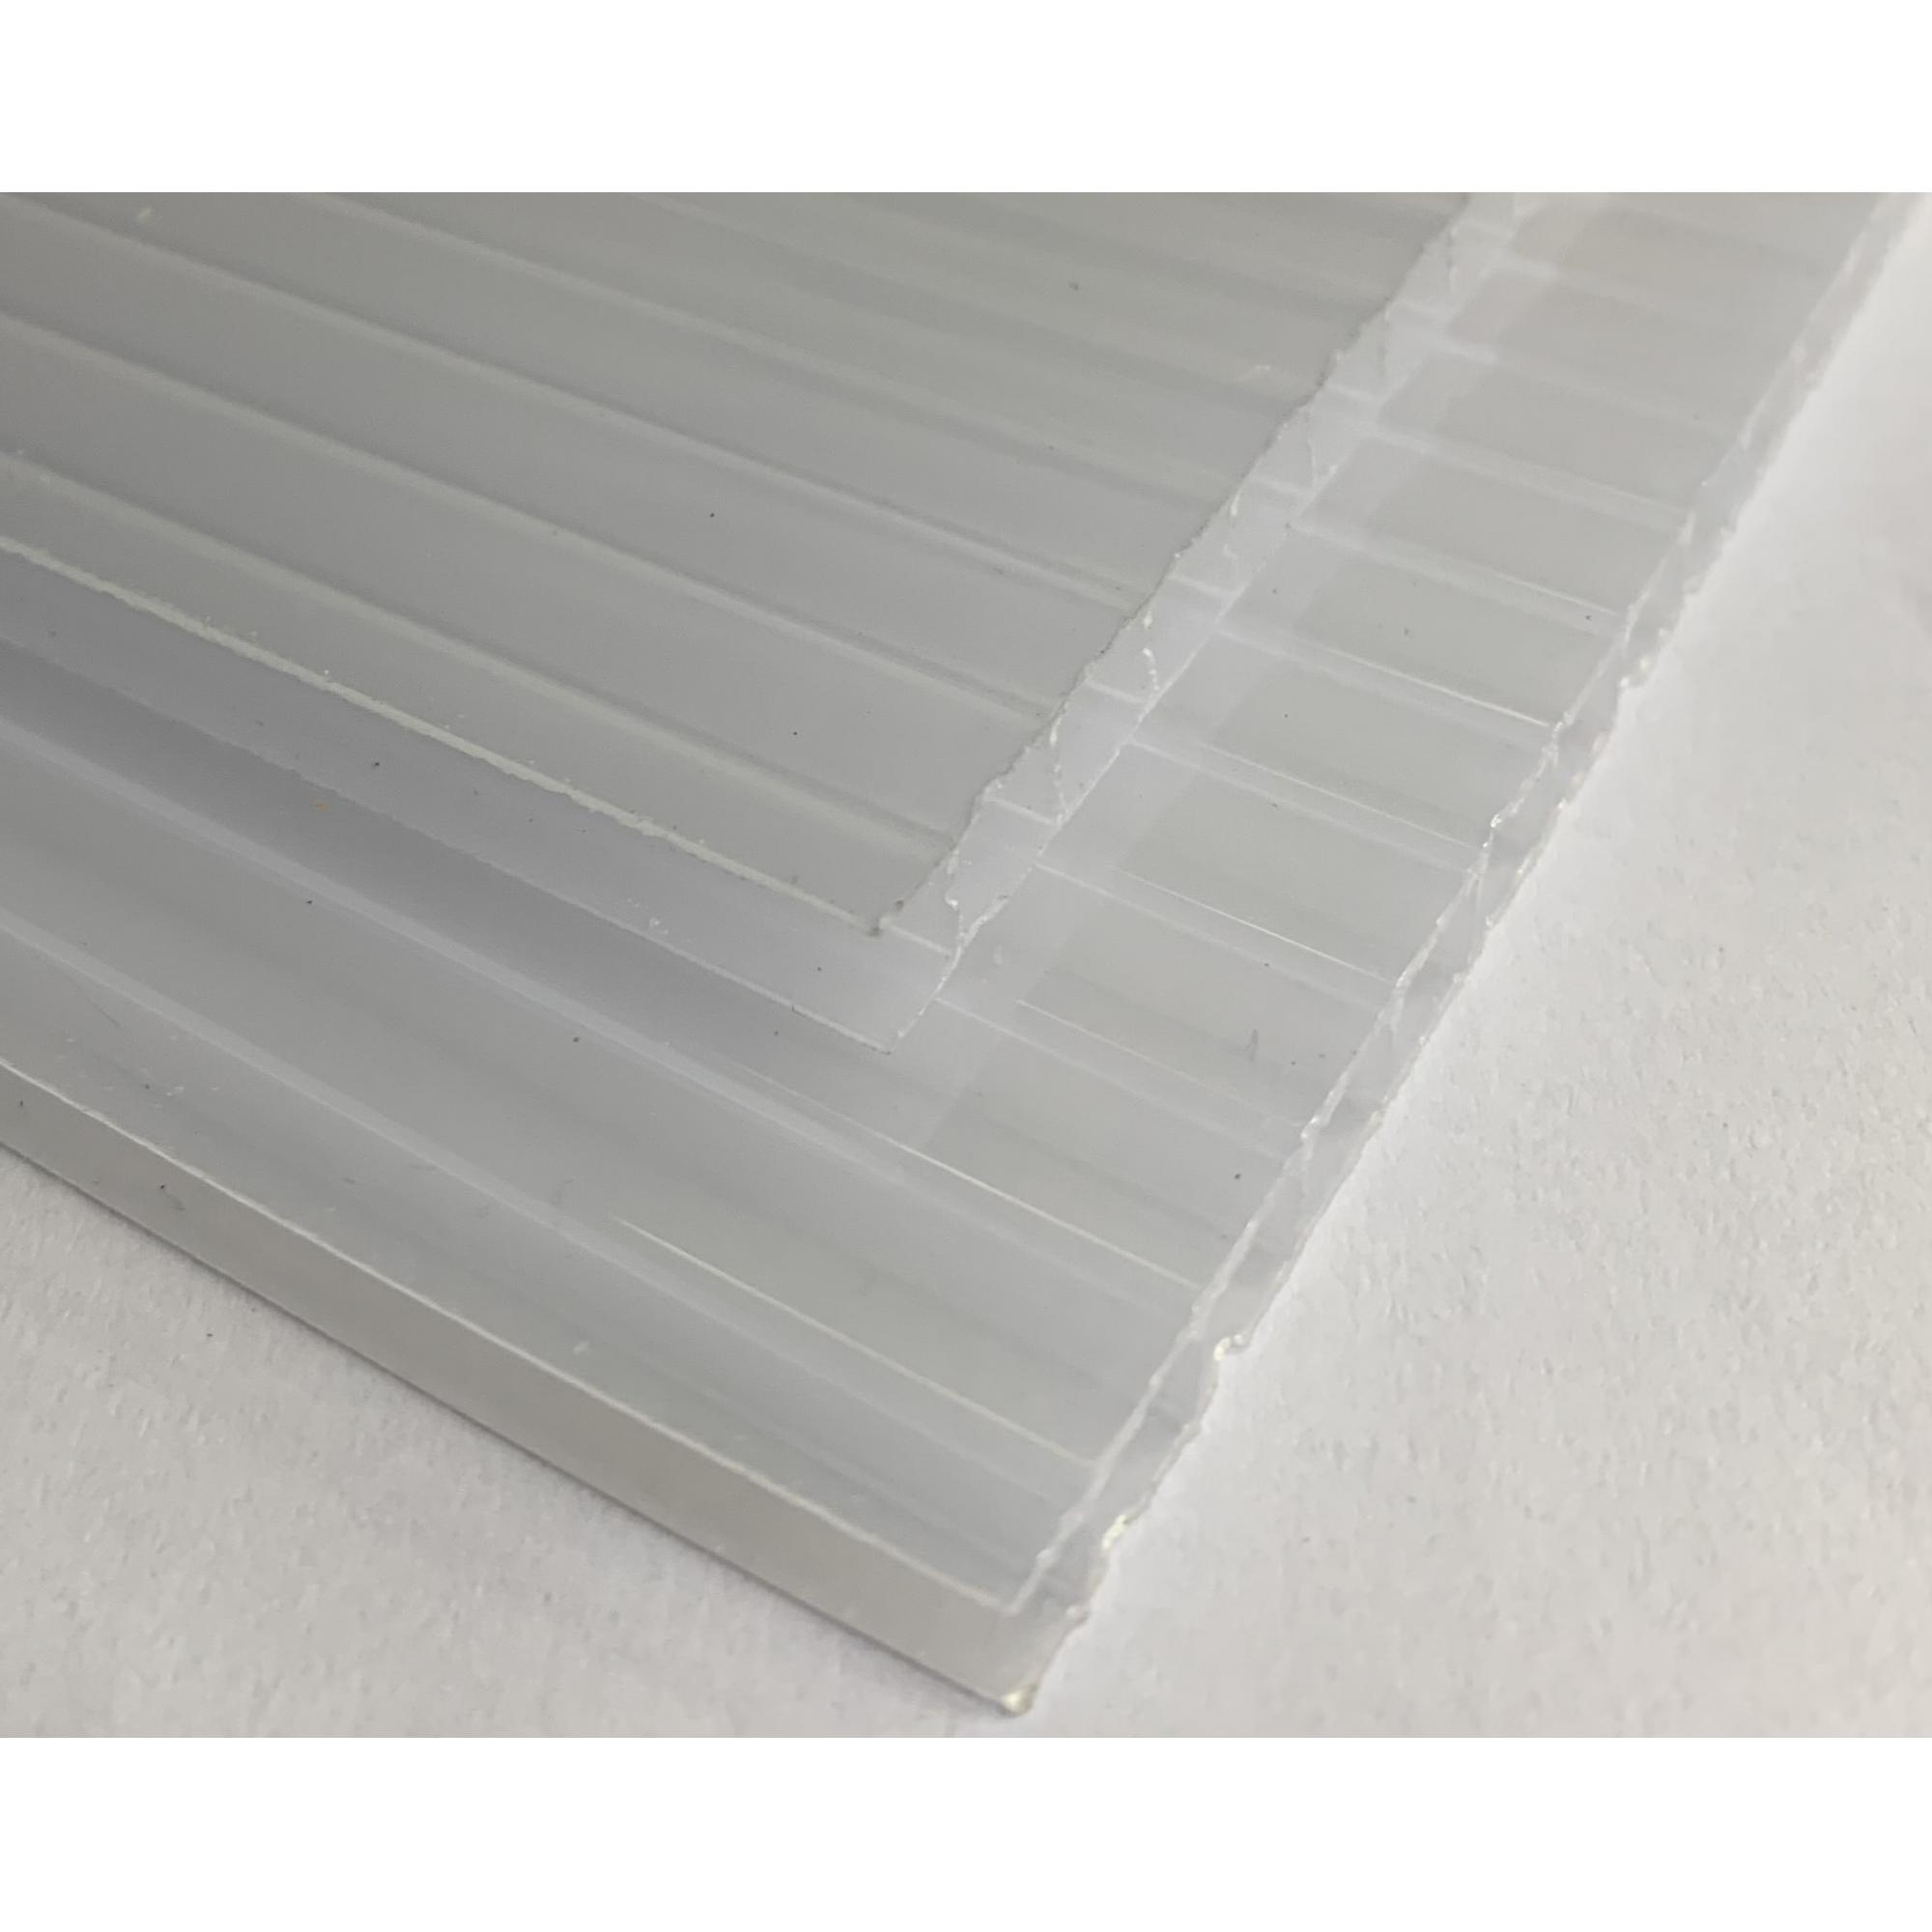 Policarbonato Alveolar Refletiva HeatblocOuro 6x1050x6000mm